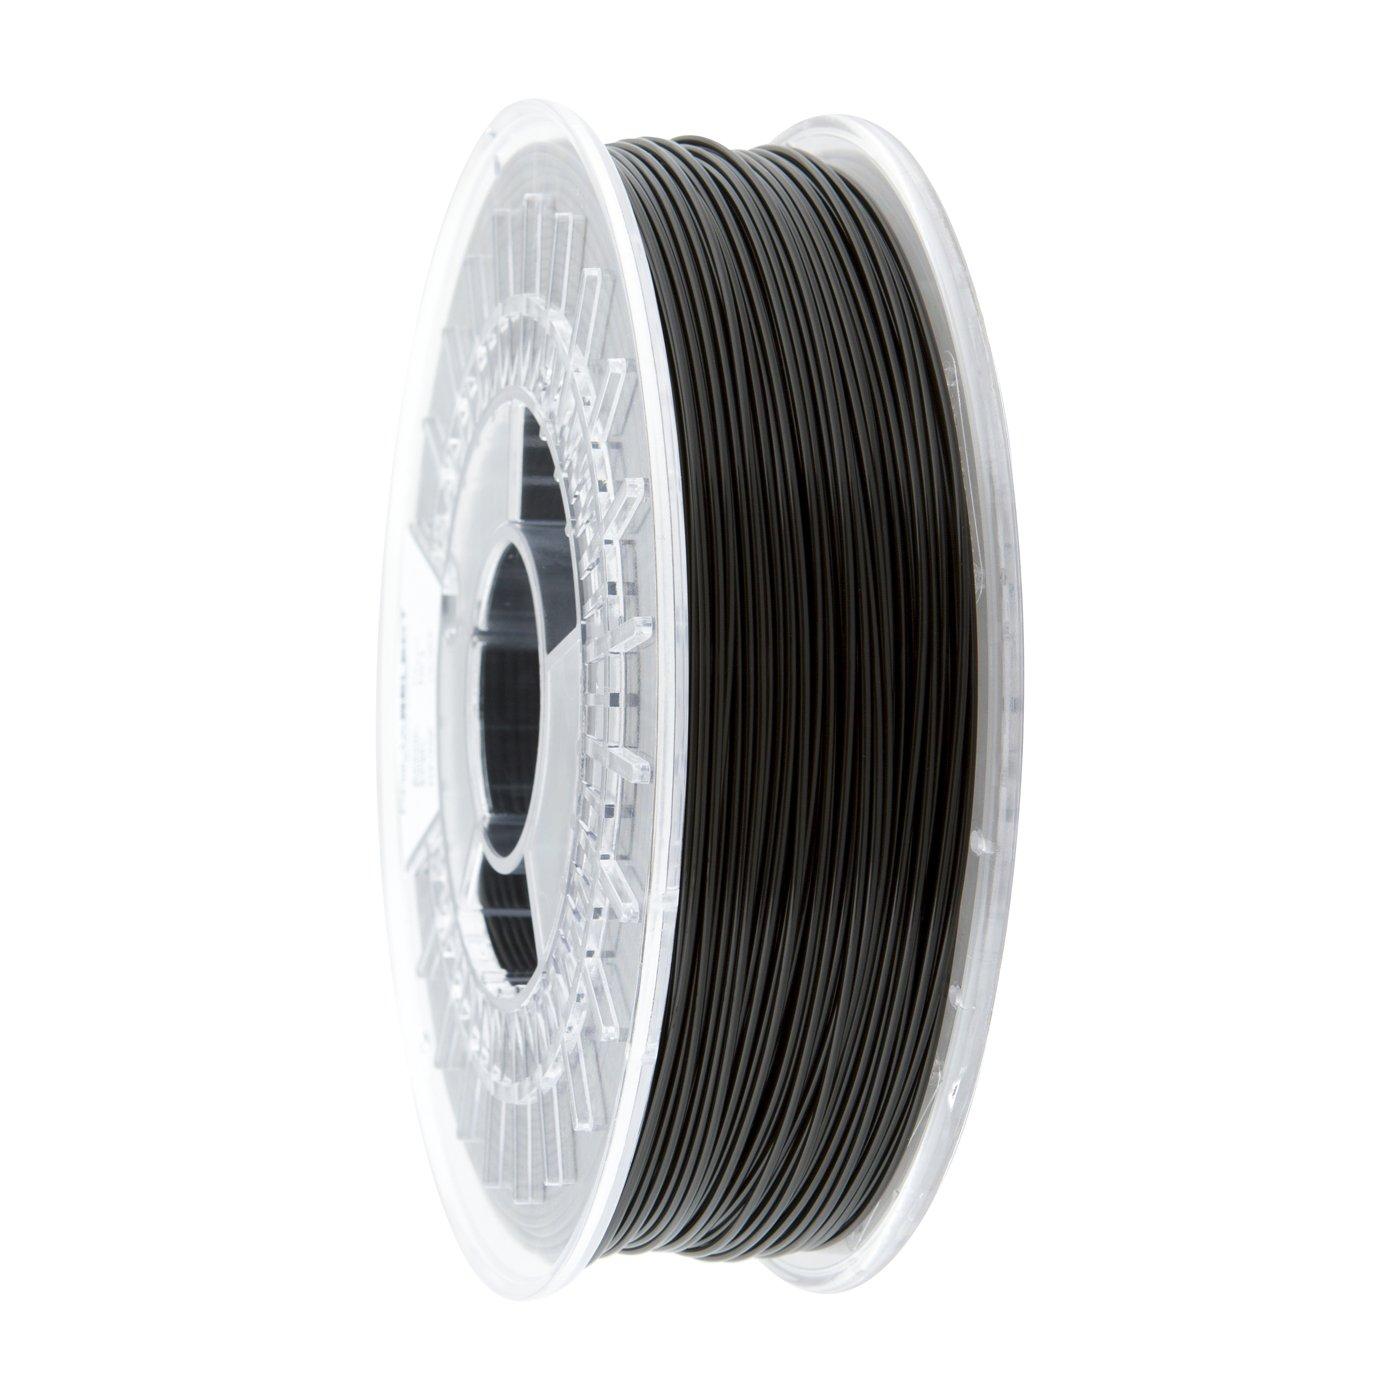 PrimaCreator PrimaSelect 3D Drucker Filament - - - PLA  - 1,75 mm - 750 g  - Silber B01KRPH8IE Filament-3D-Druckmaterialien f00c25